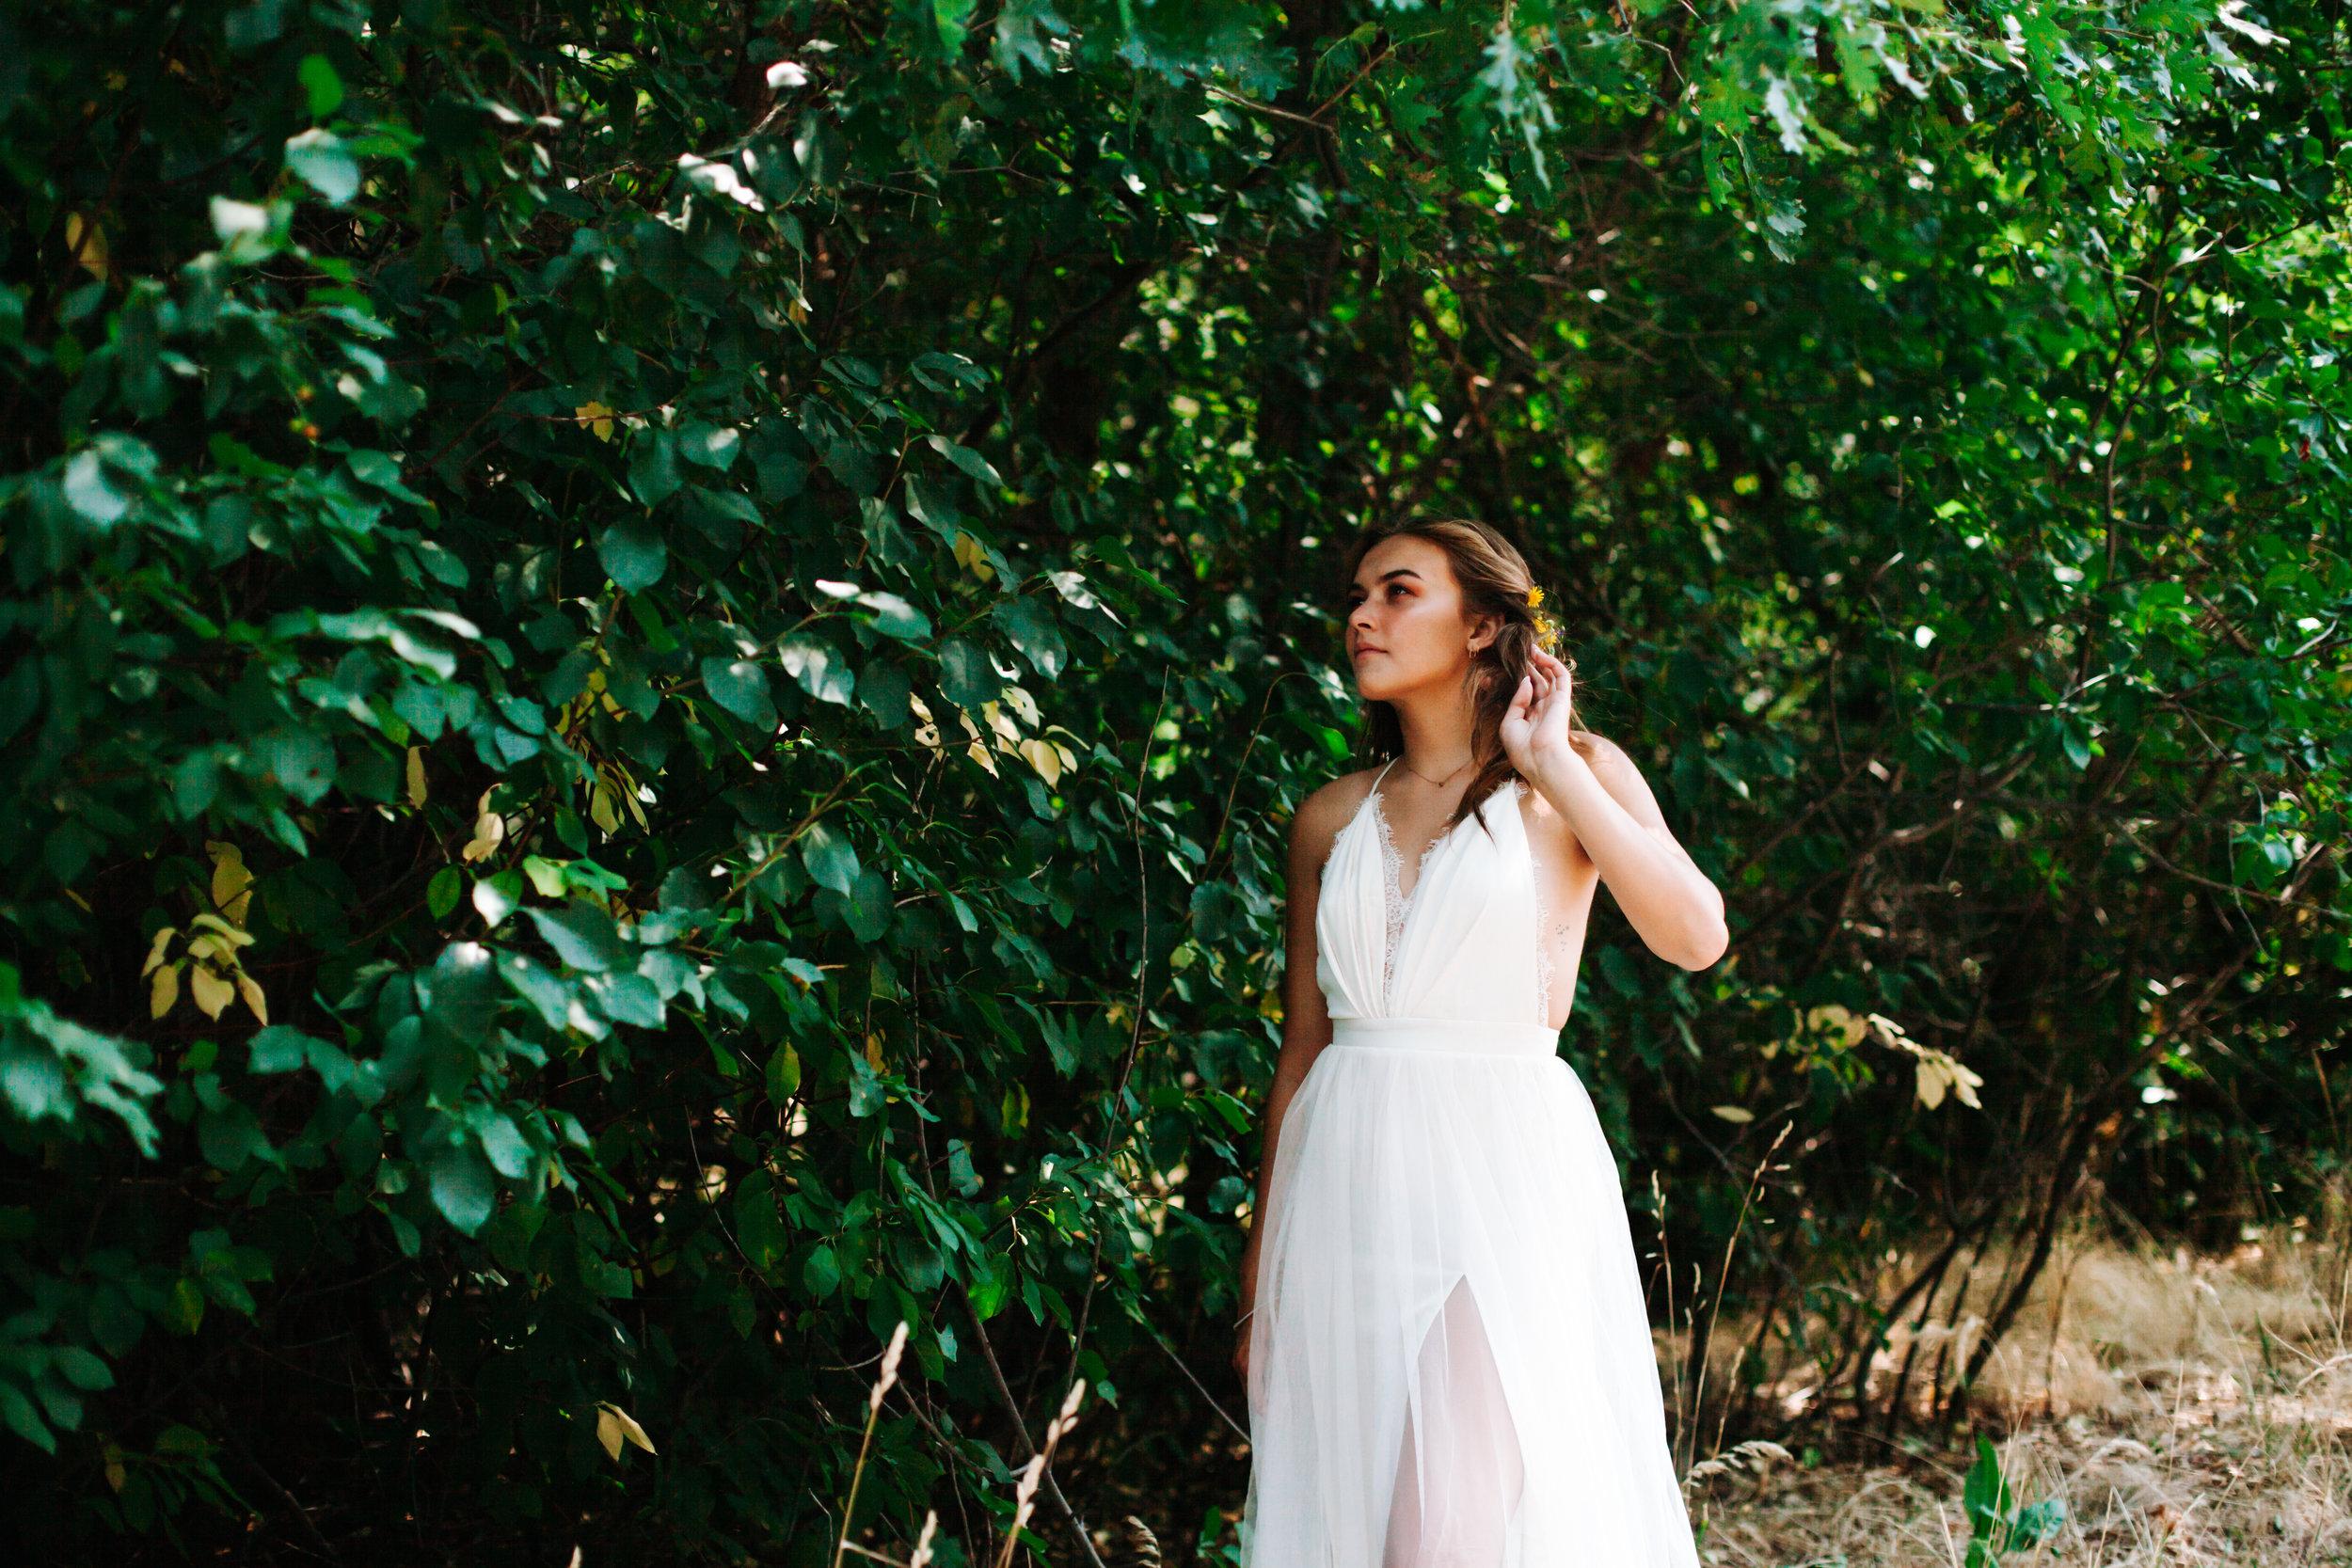 Utah Canyon Wedding, Formal Wedding Photos, Bridal Portraits, Utah Wedding Photographer, Salt Lake City Wedding, Salt Lake City Wedding Photographer | Marina Rey Photography